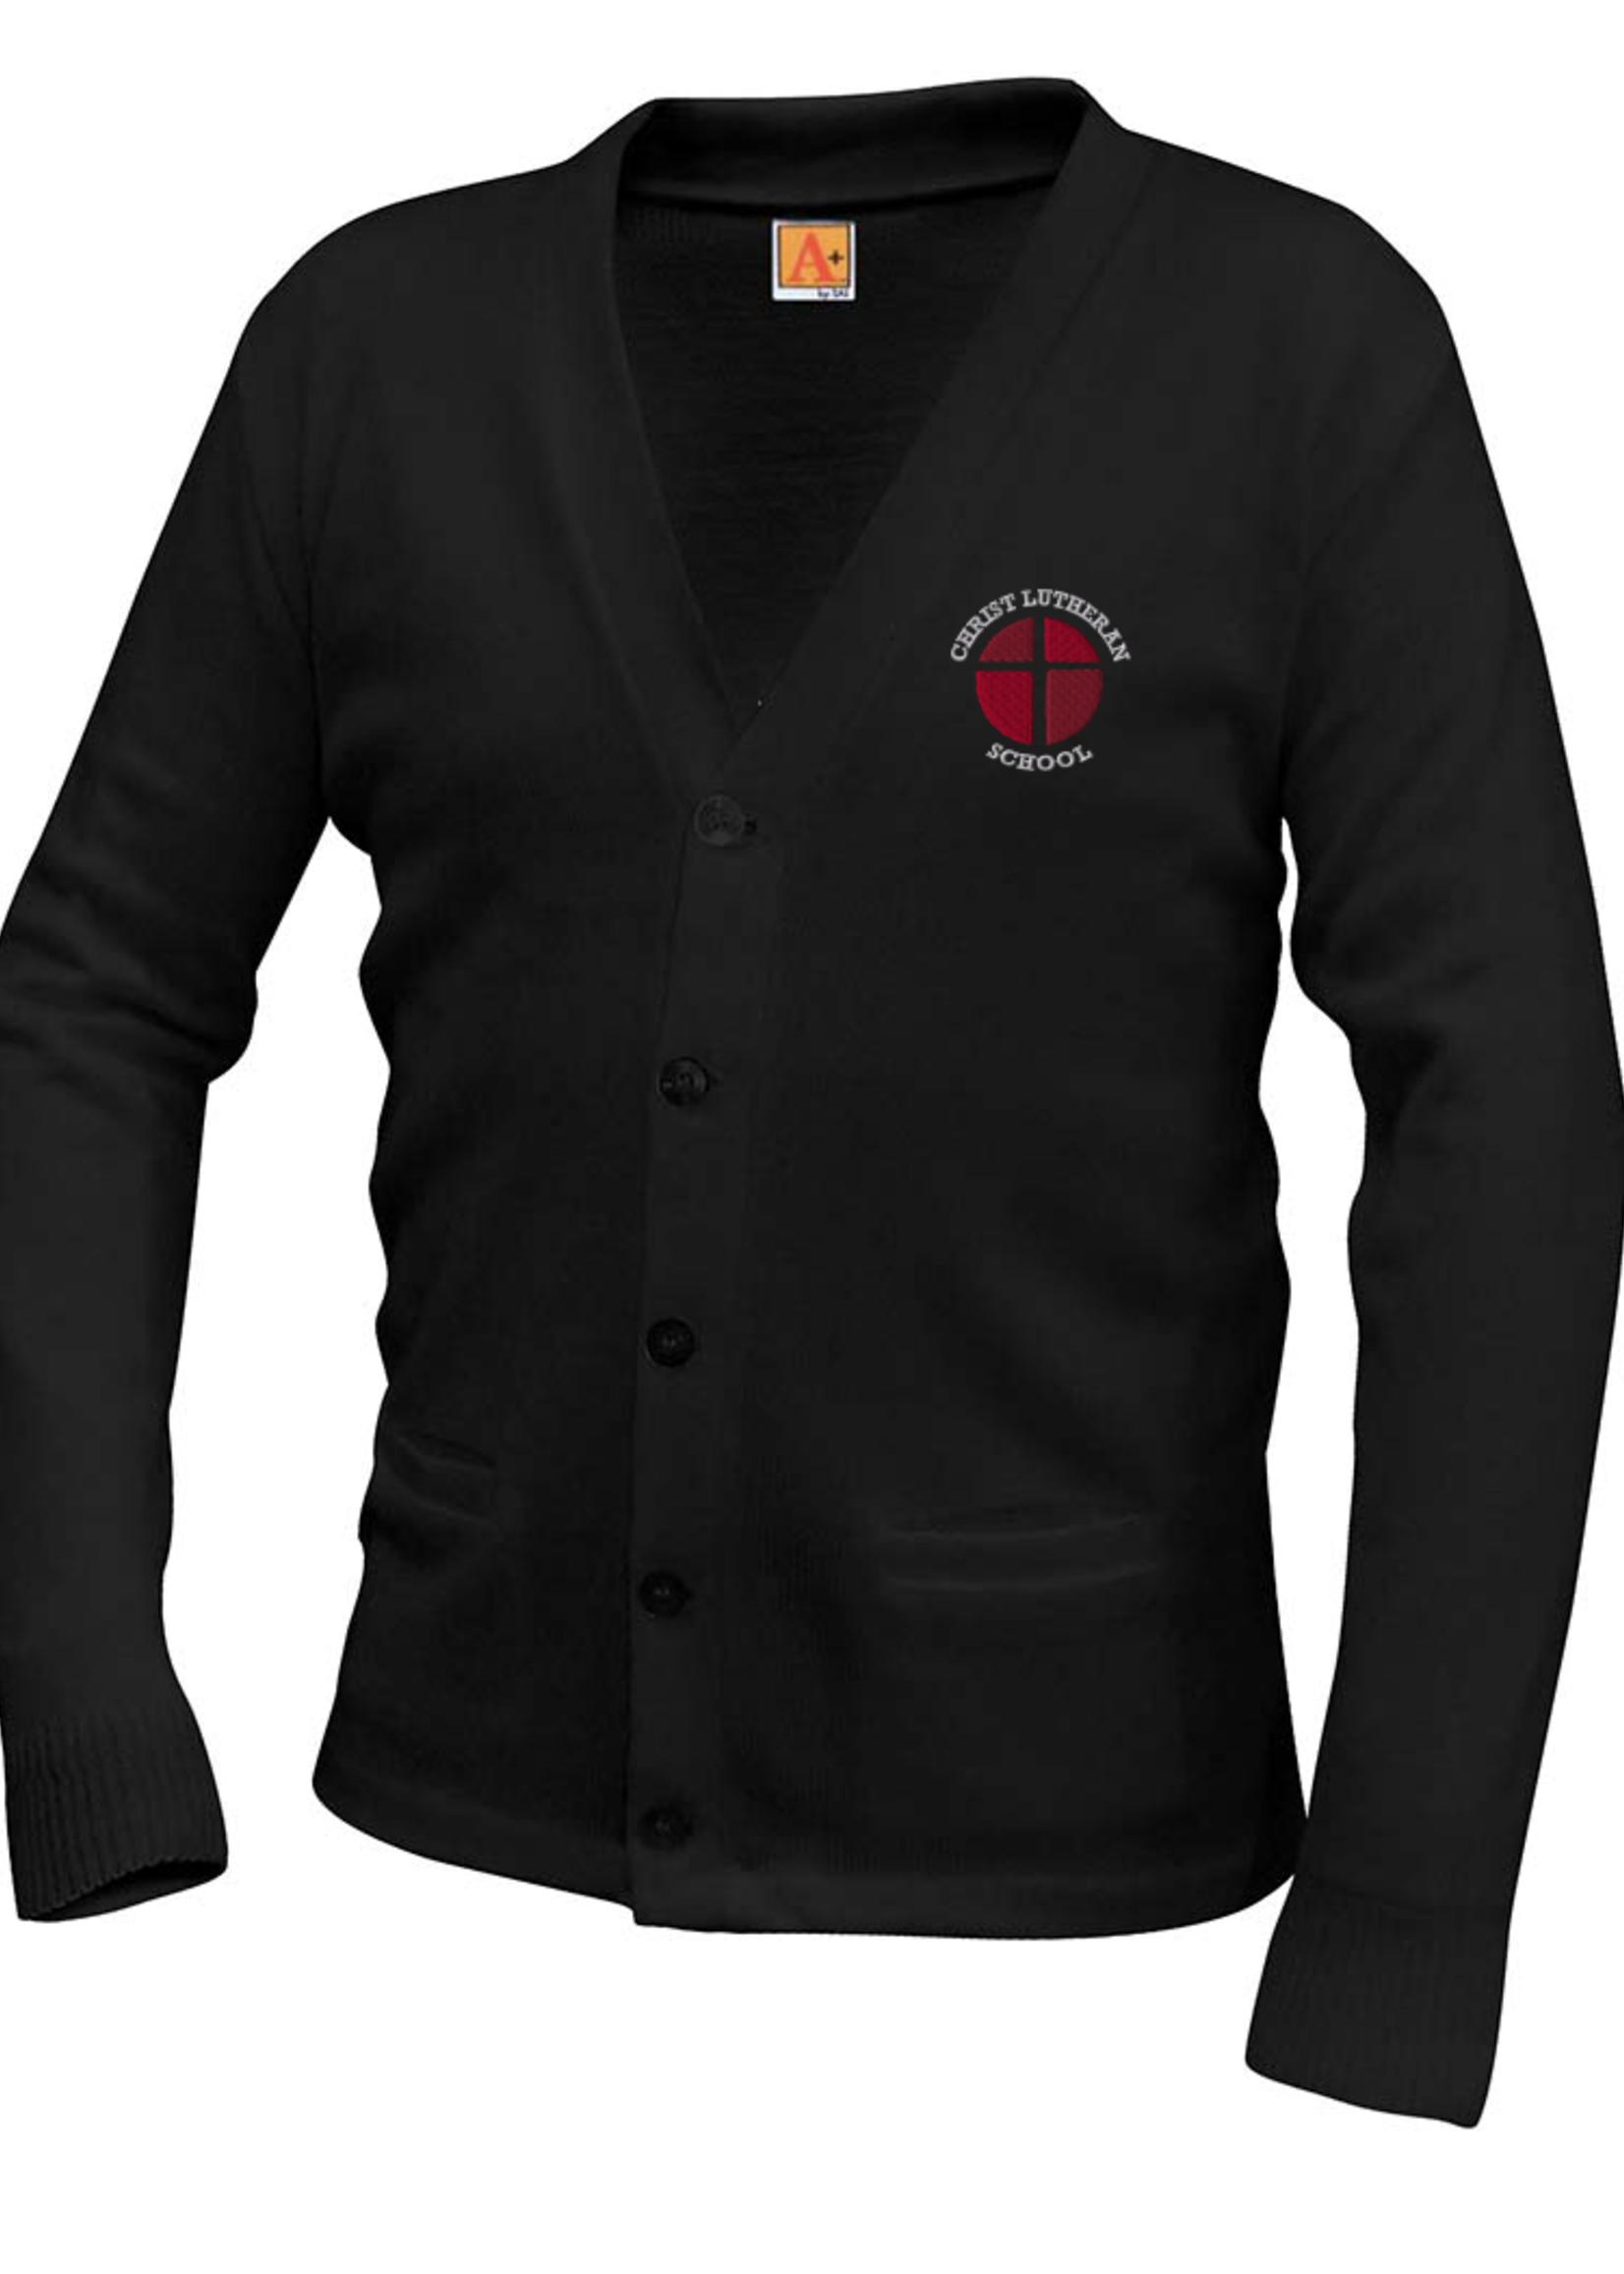 CLS Black V-neck cardigan sweater with pockets